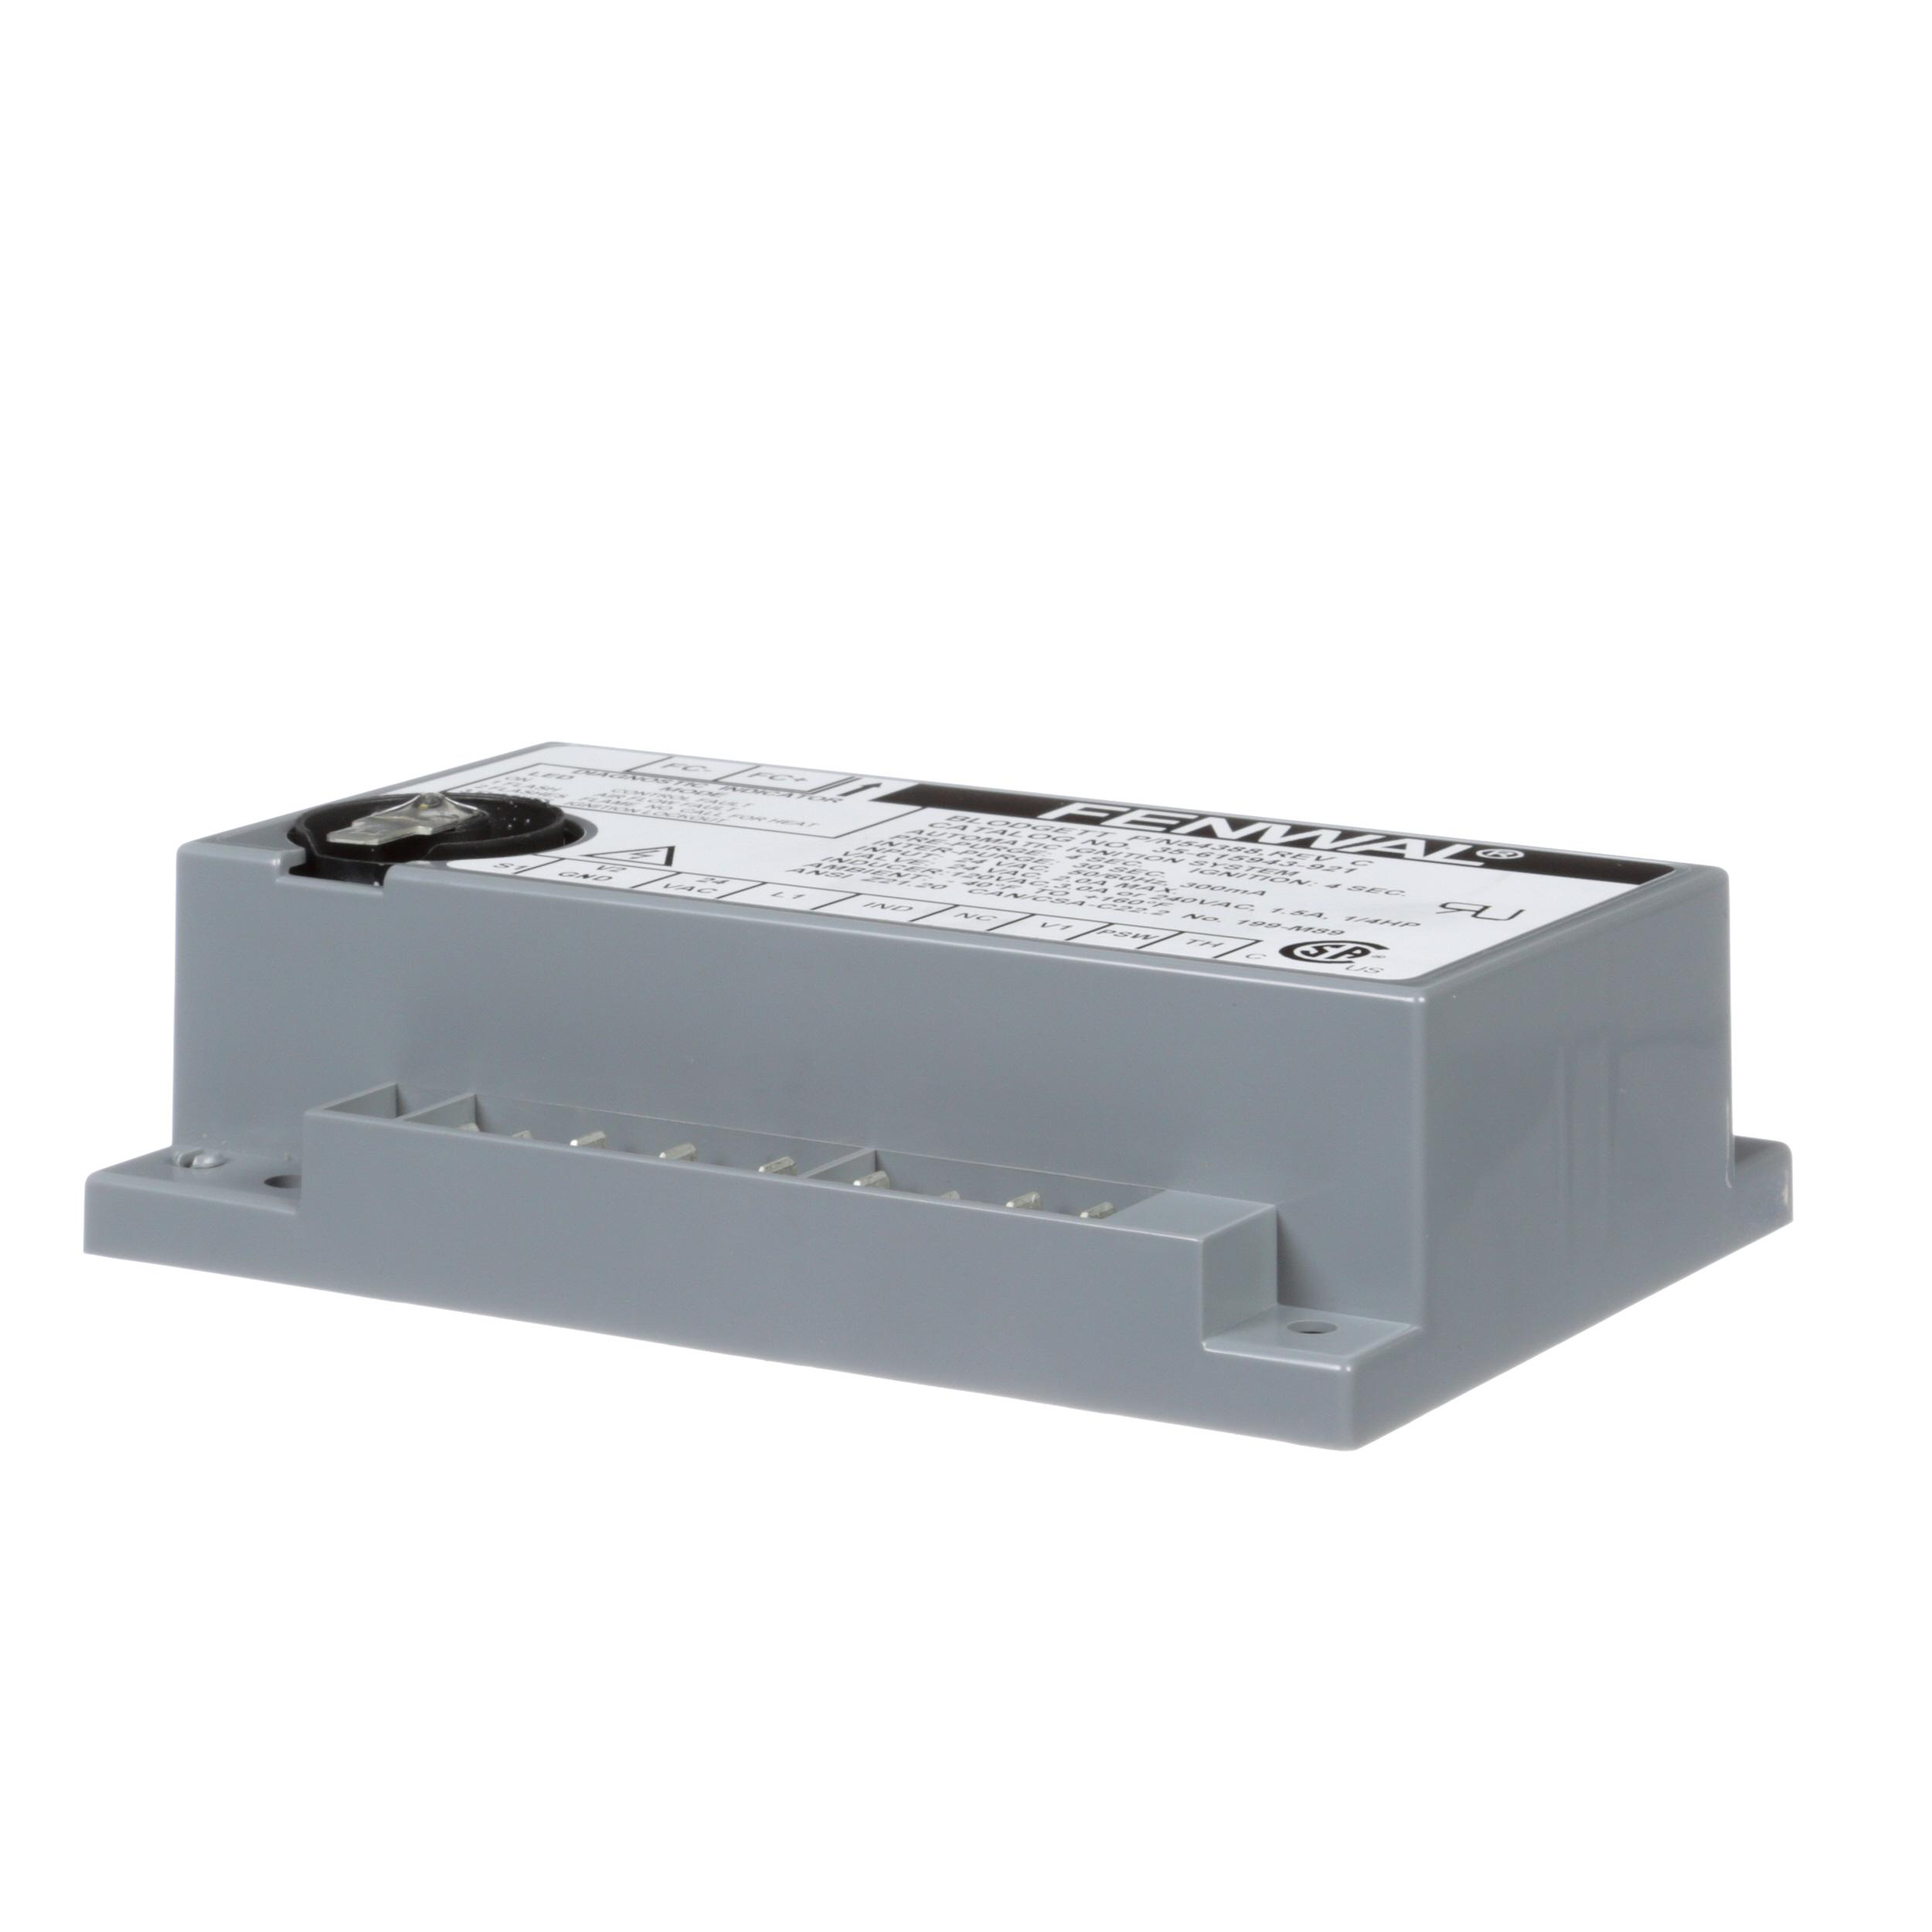 kawasaki 100 wiring diagram blodgett dfg 100 wiring diagram blodgett control,ignition,fenwal hv100g | part #54388